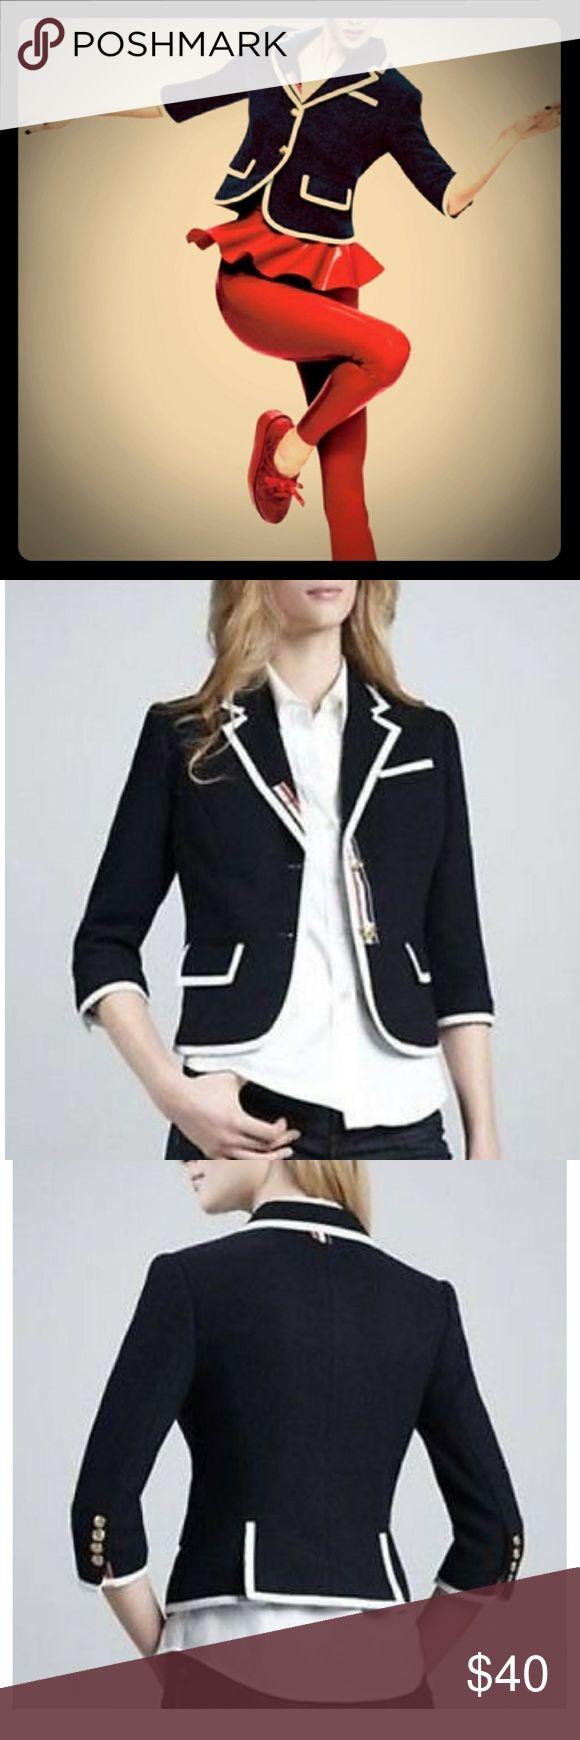 SALE🎉Thom Browne Neiman Marcus×Target Wool Blazer Good condition Thom Browne Jackets & Coats Blazers